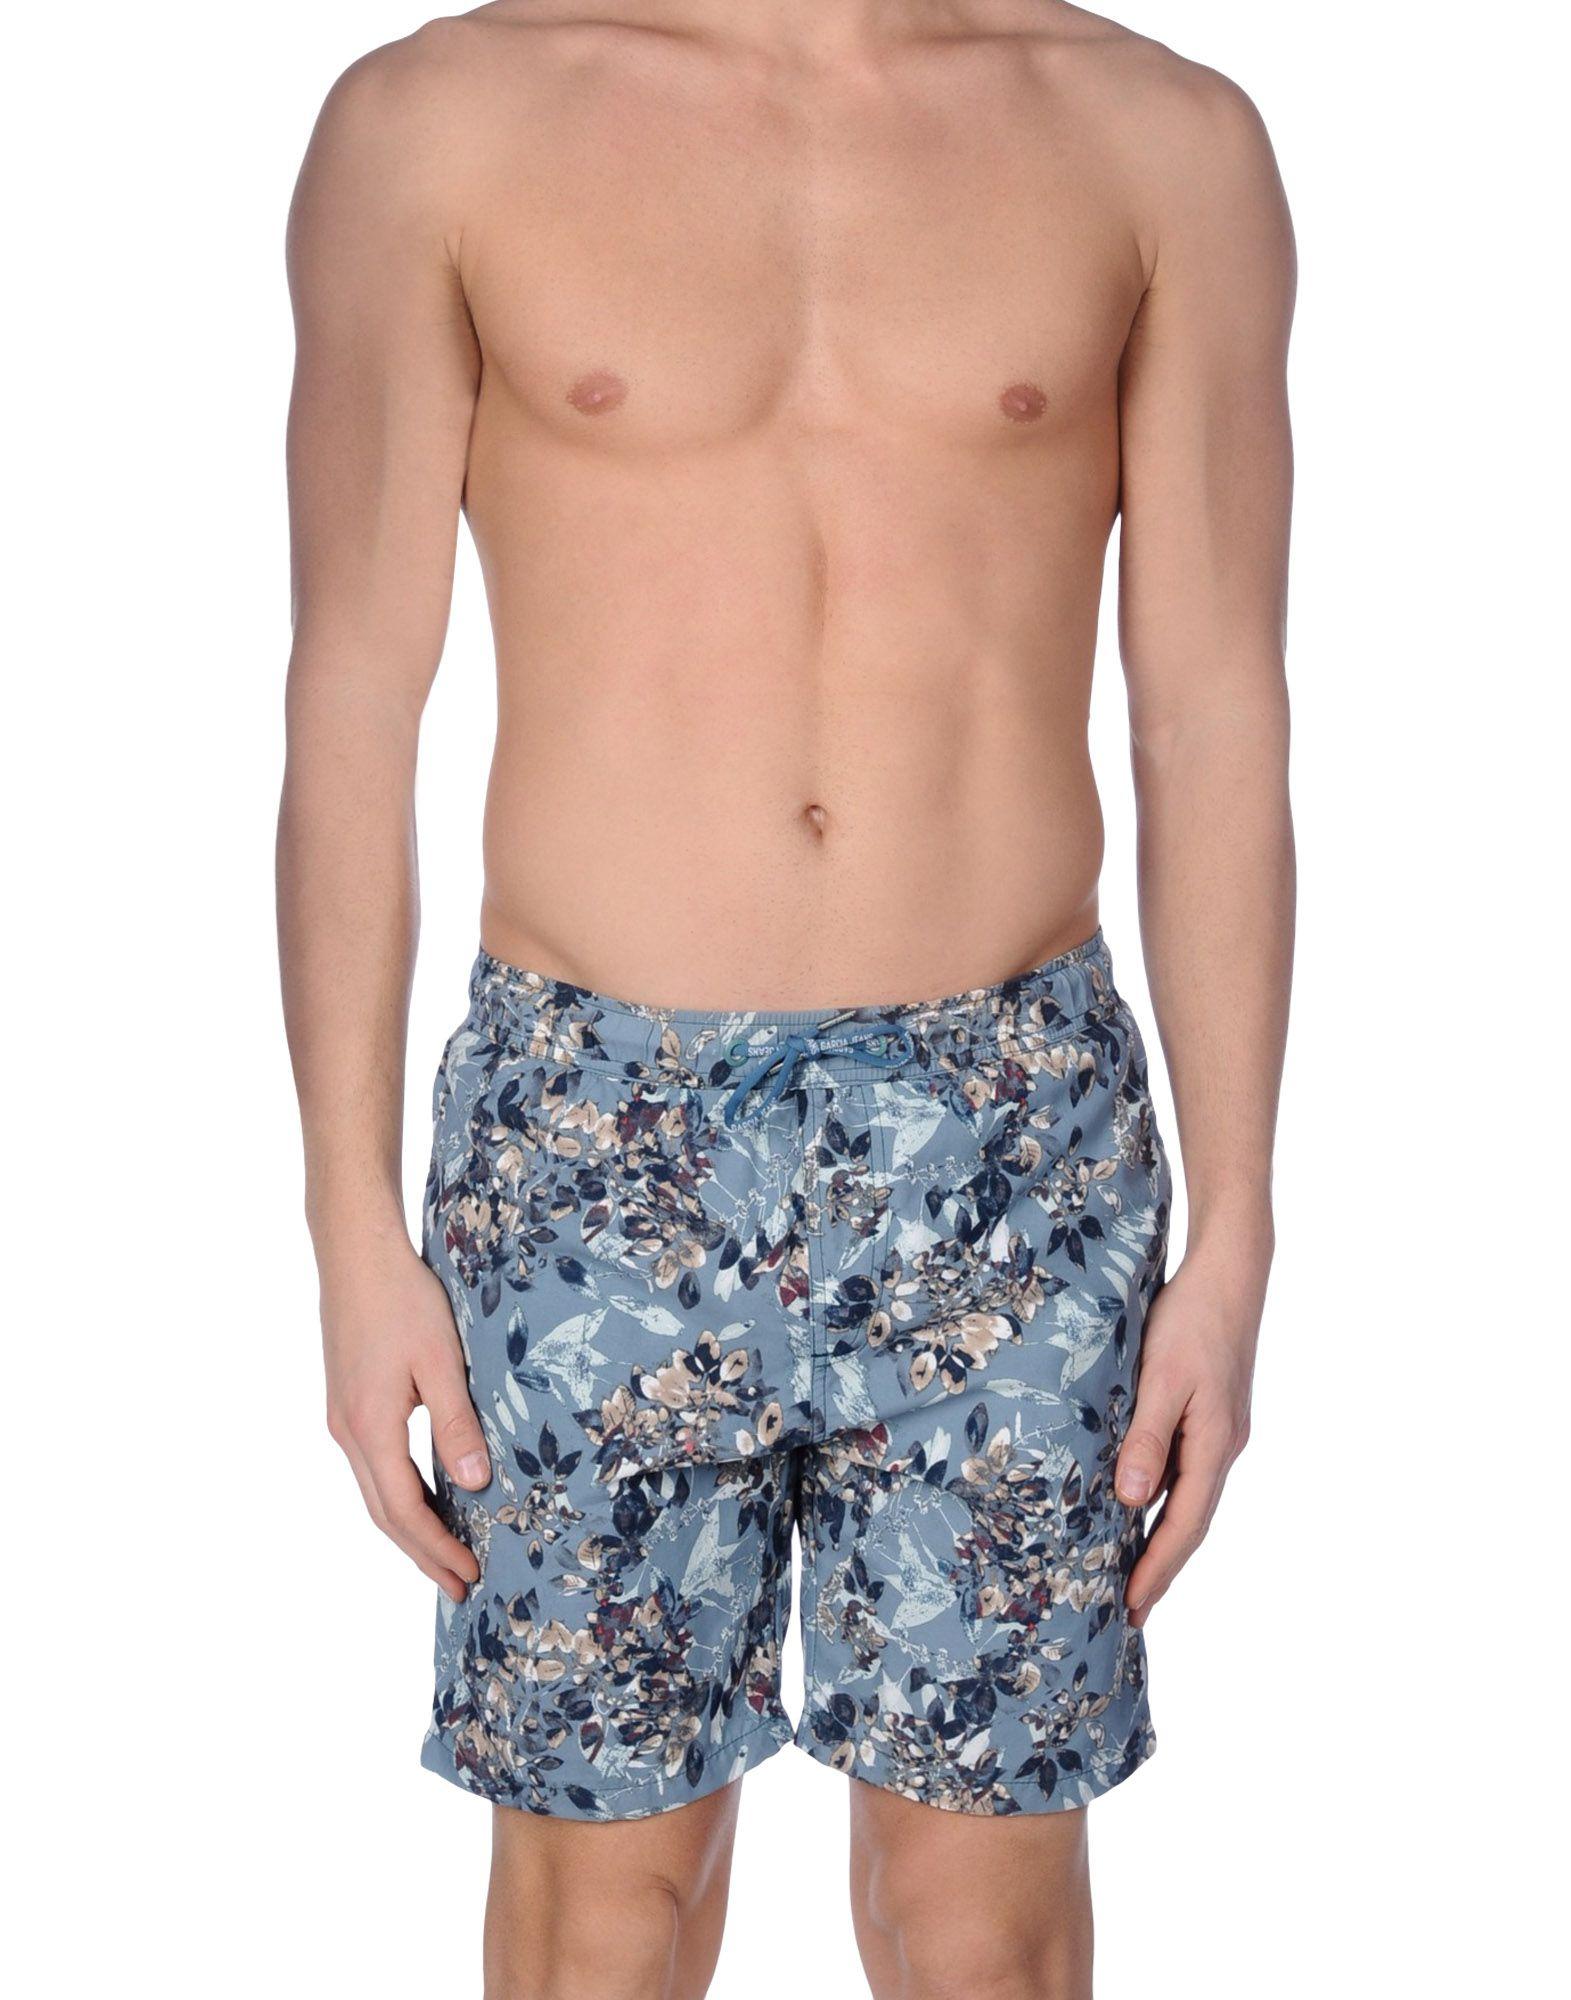 garcia jeans официальный сайт GARCIA JEANS Шорты для плавания